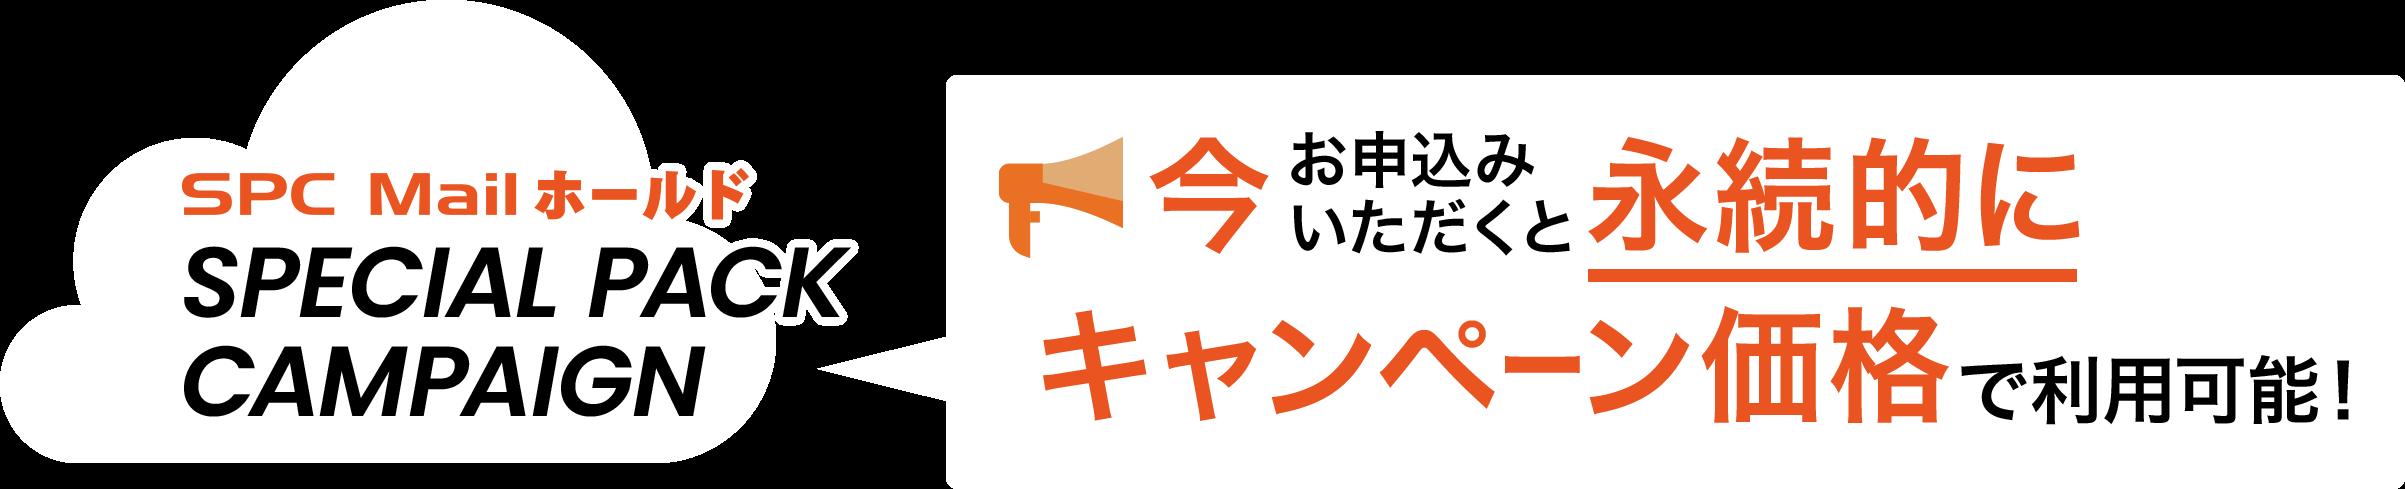 txt_campaign_01_pc